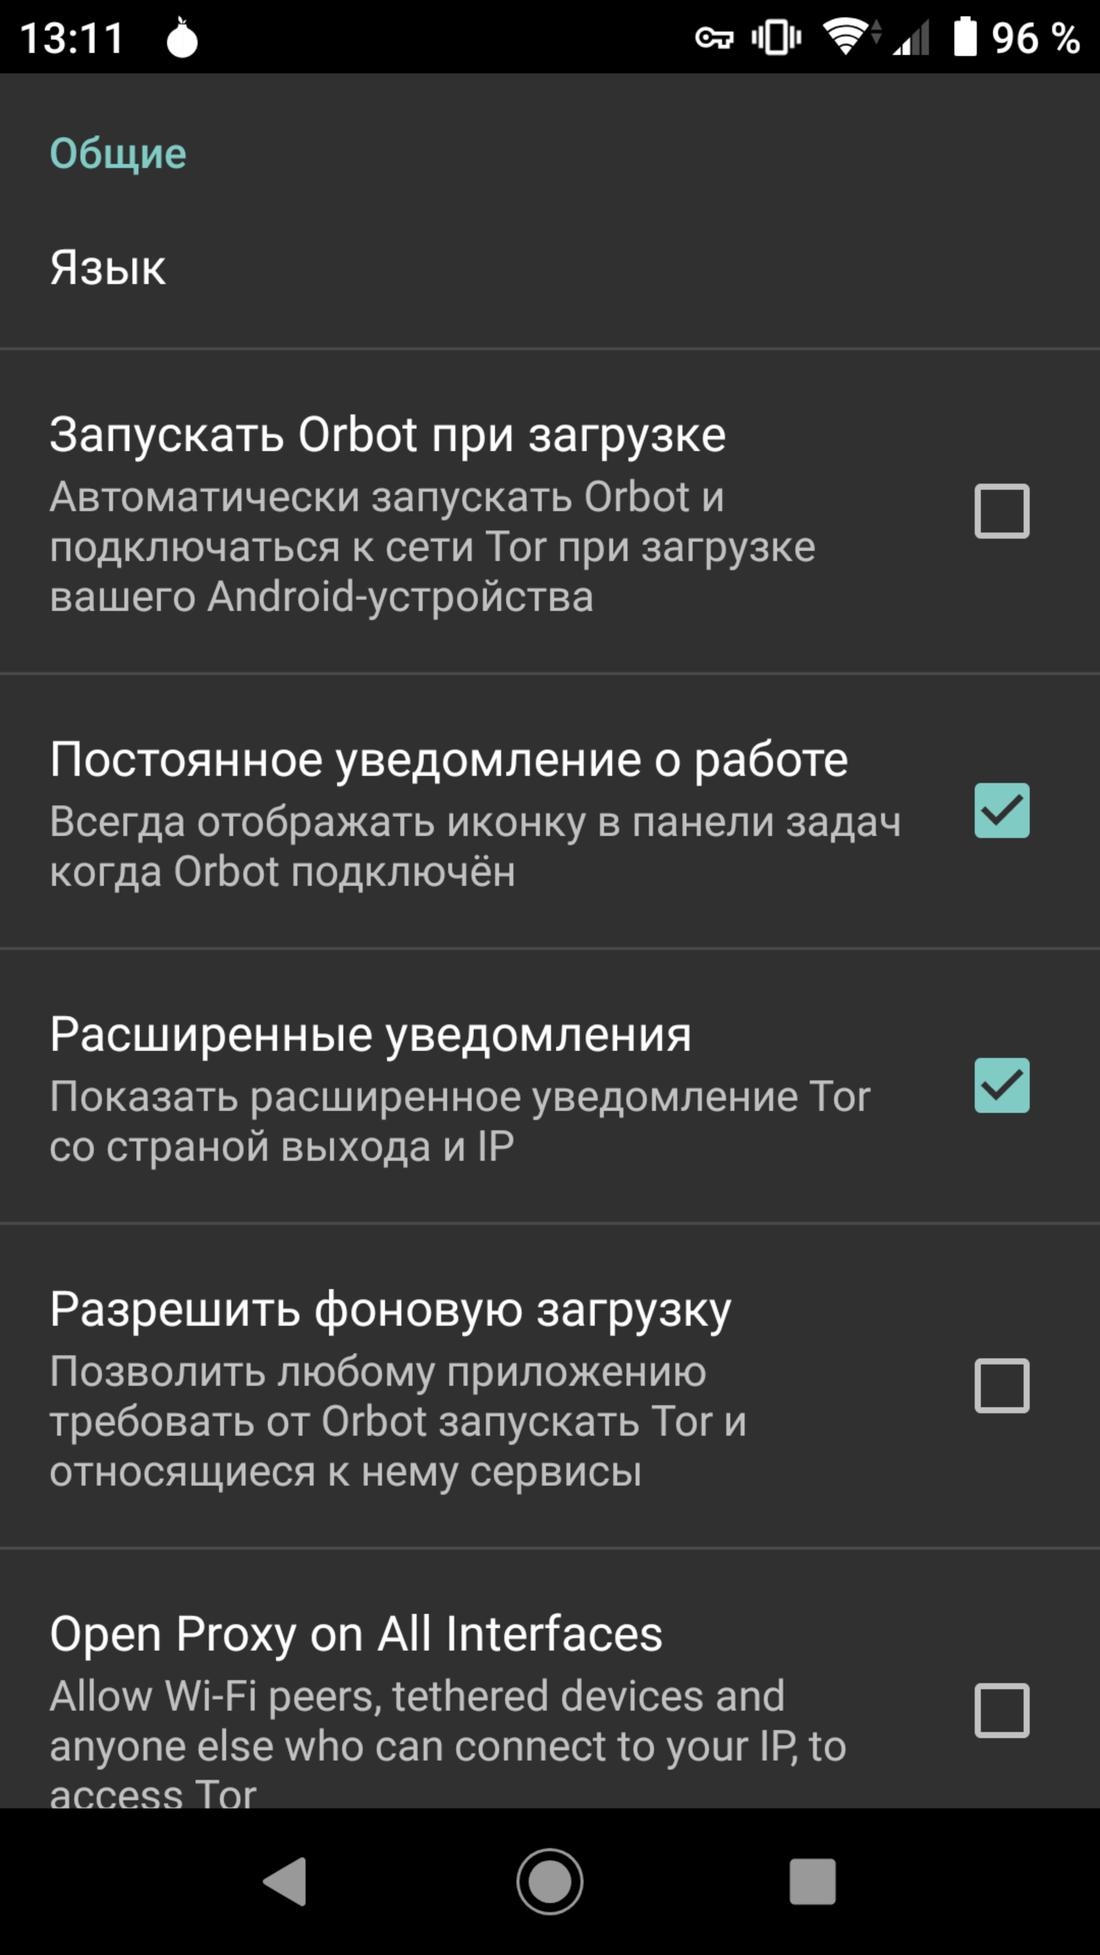 Скриншот #1 из программы Orbot: Proxy with Tor